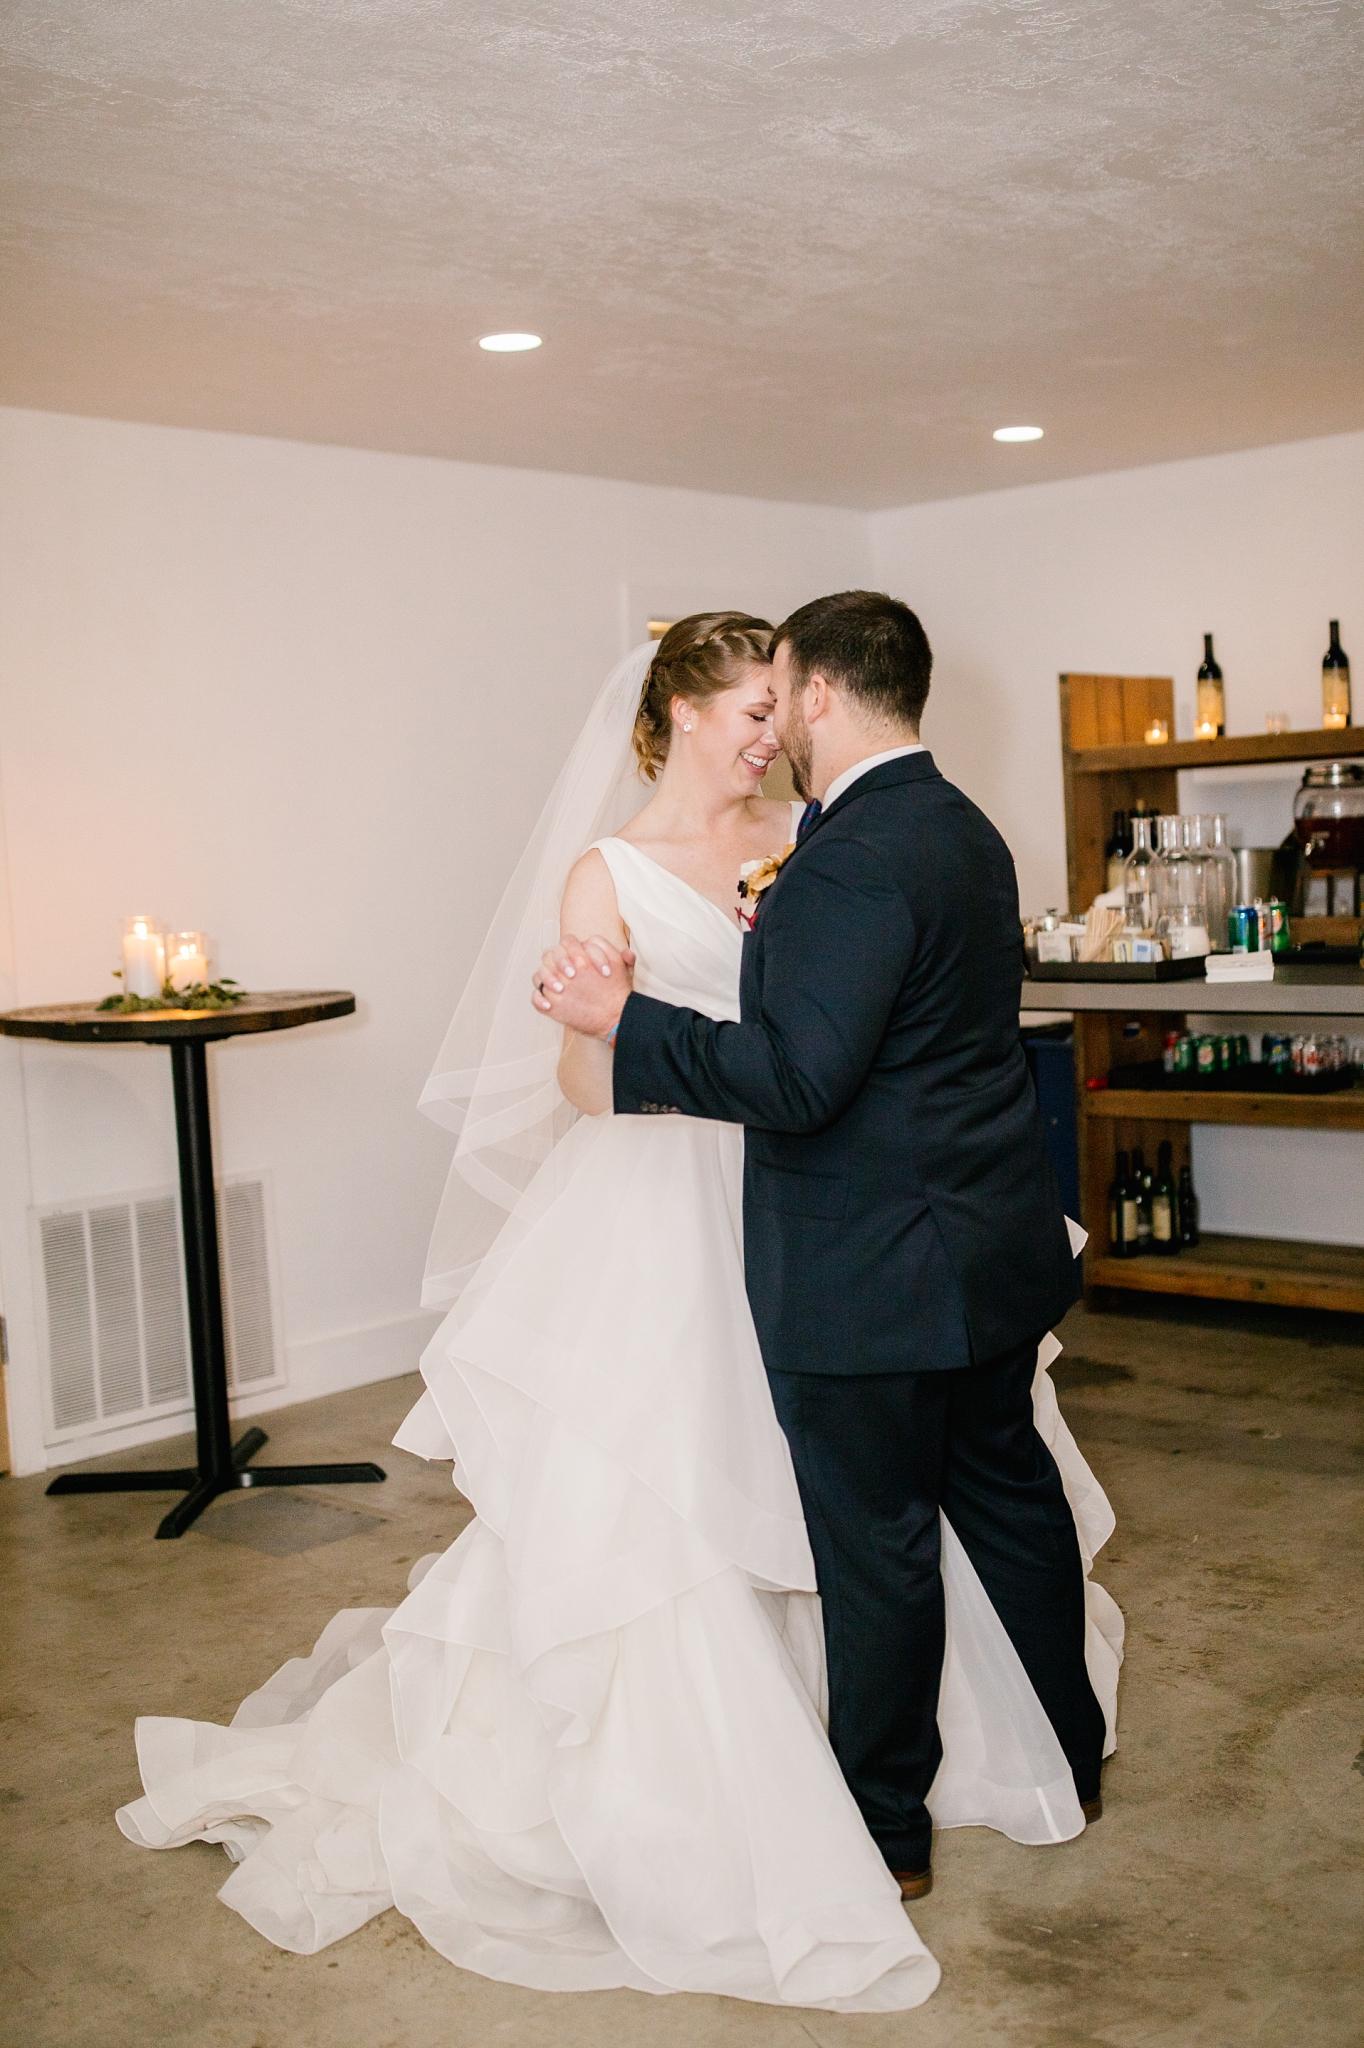 CN-Wedding-429_Lizzie-B-Imagery-Utah-Wedding-Photographer-Blessed-Sacrament-Catholic-Church-Sandy-Utah-The-Blended-Table-Salt-Lake-City.jpg